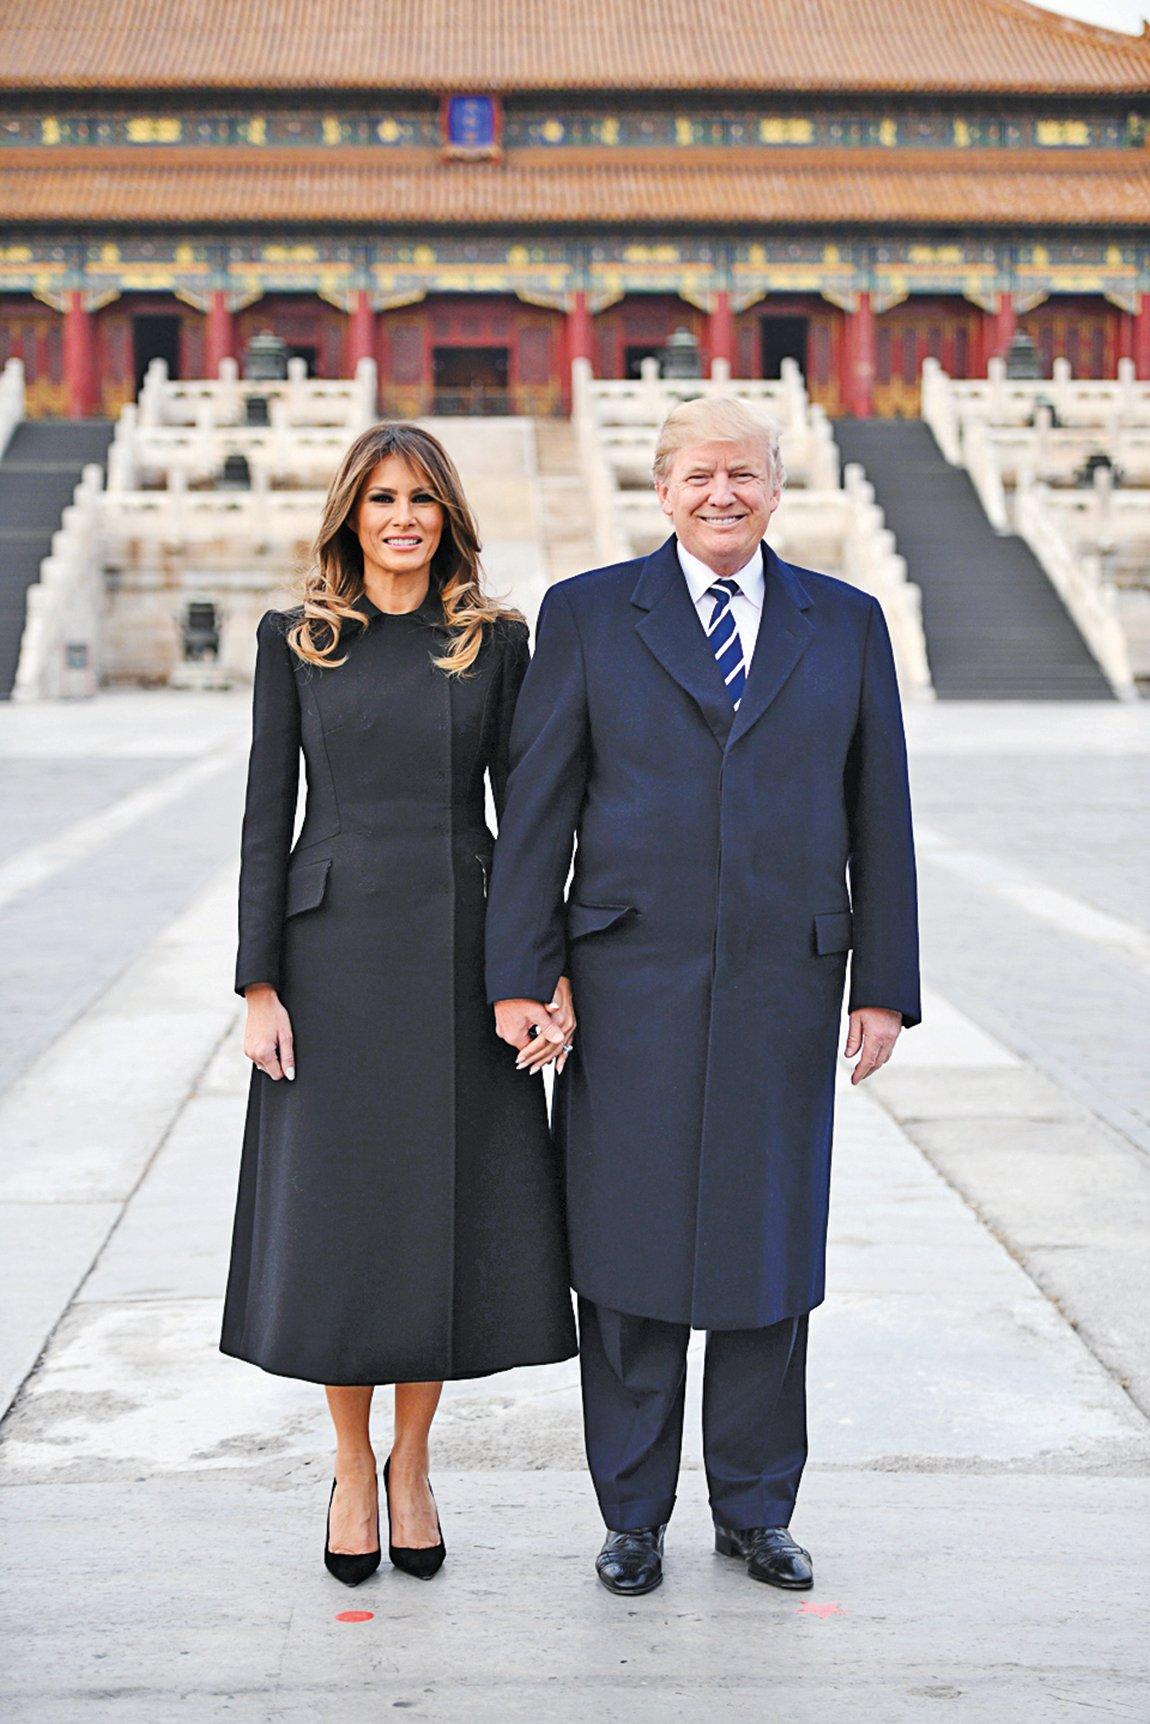 特朗普夫婦在太和殿前合影。(JIM WATSON/AFP/Getty Images)